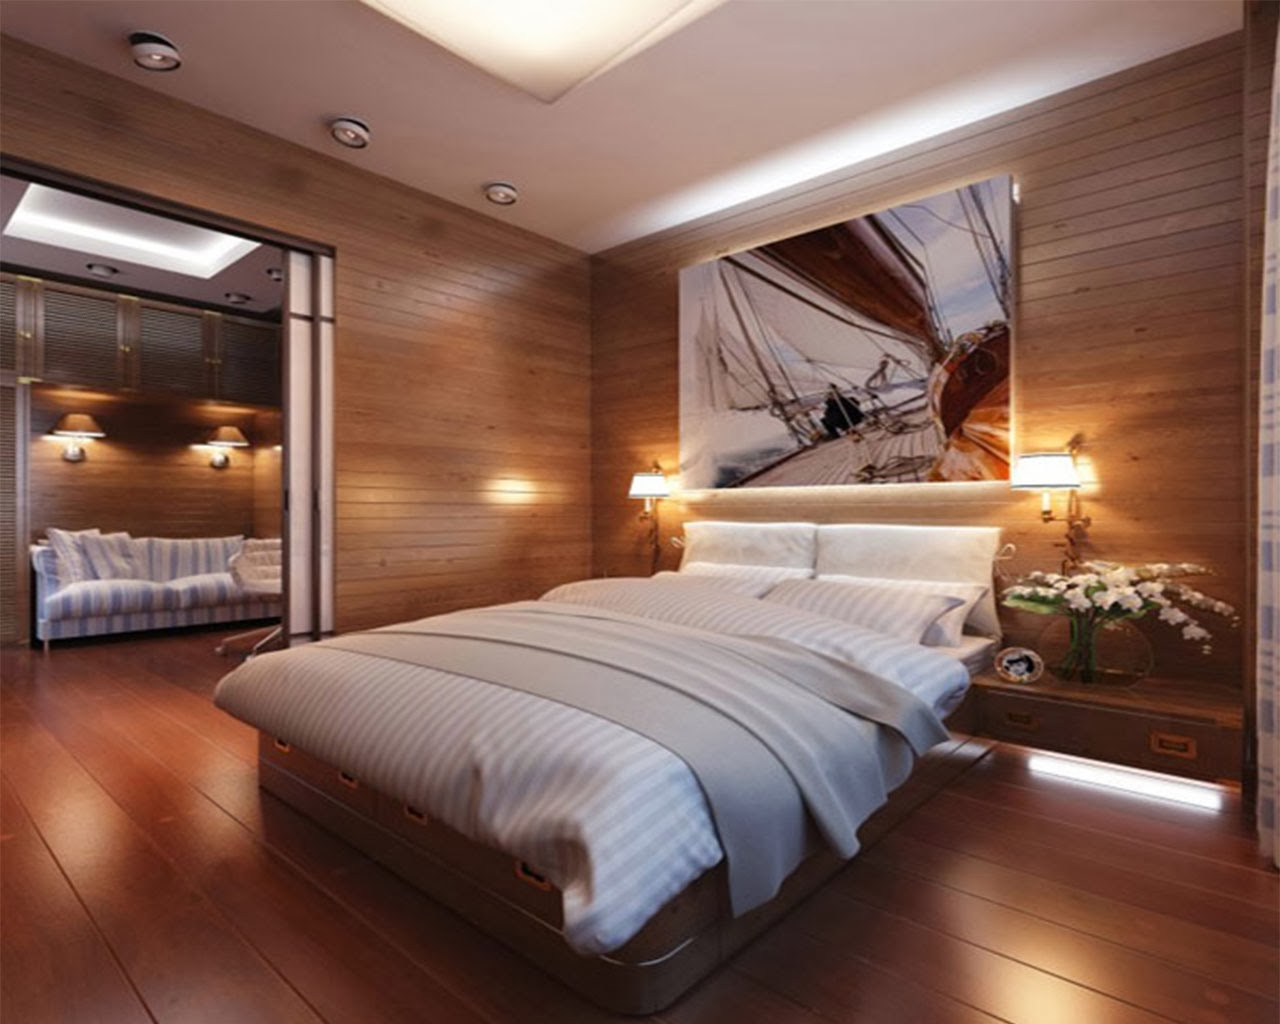 Bedroom Designs 2014 - Moi Tres Jolie